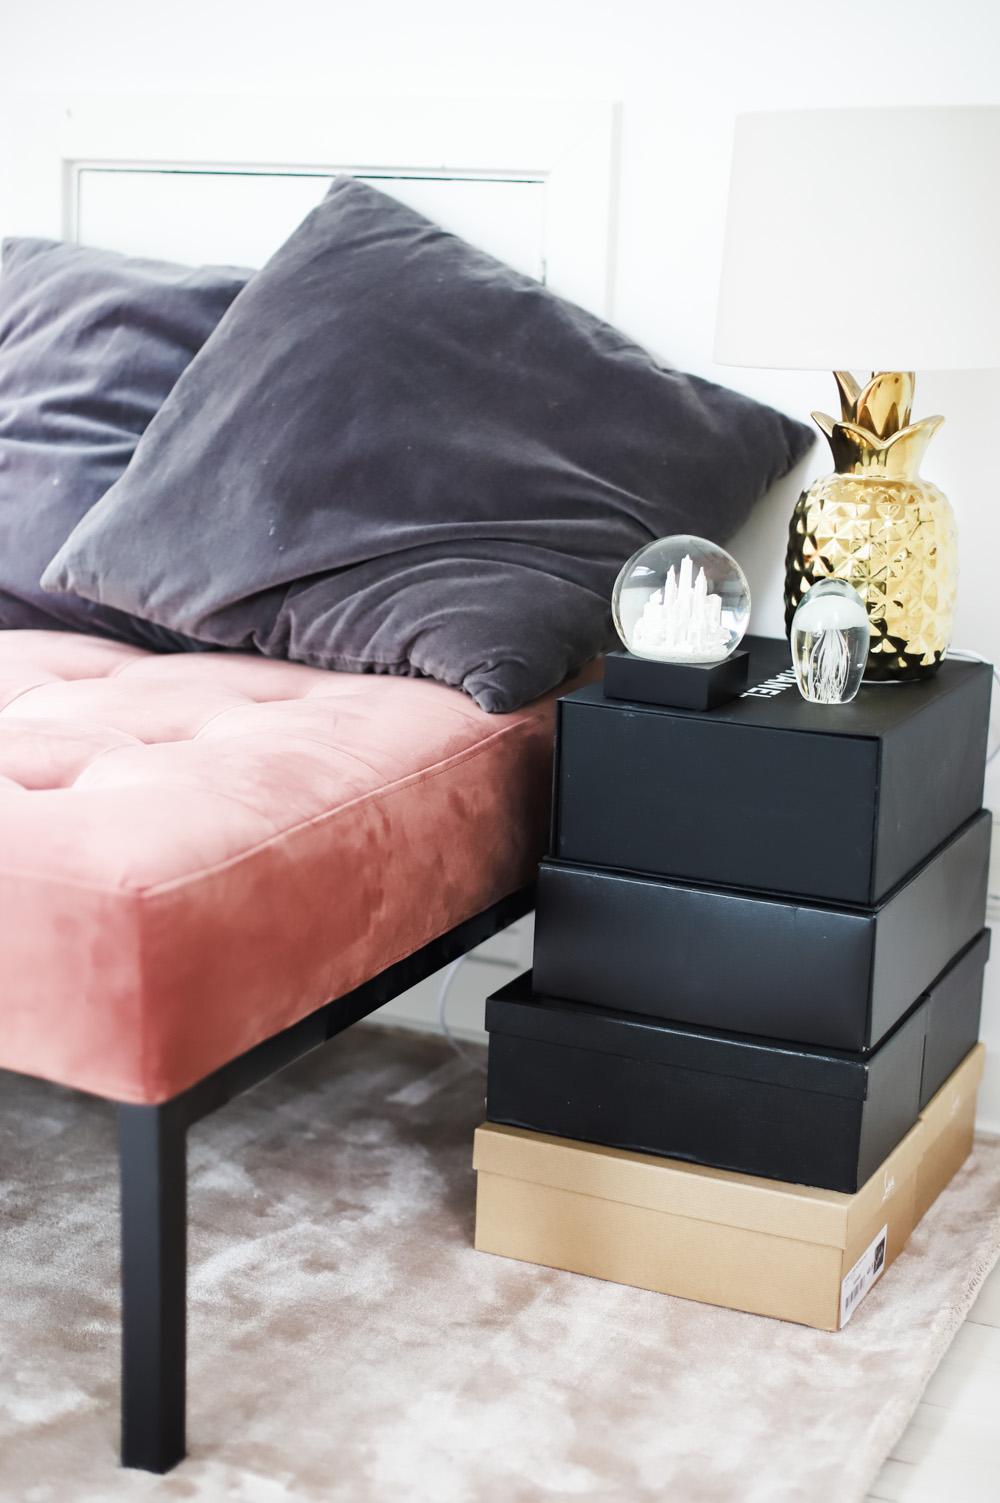 jotex-rabatkode-room-make-over-sovevarelse-velour-puf-3-of-18